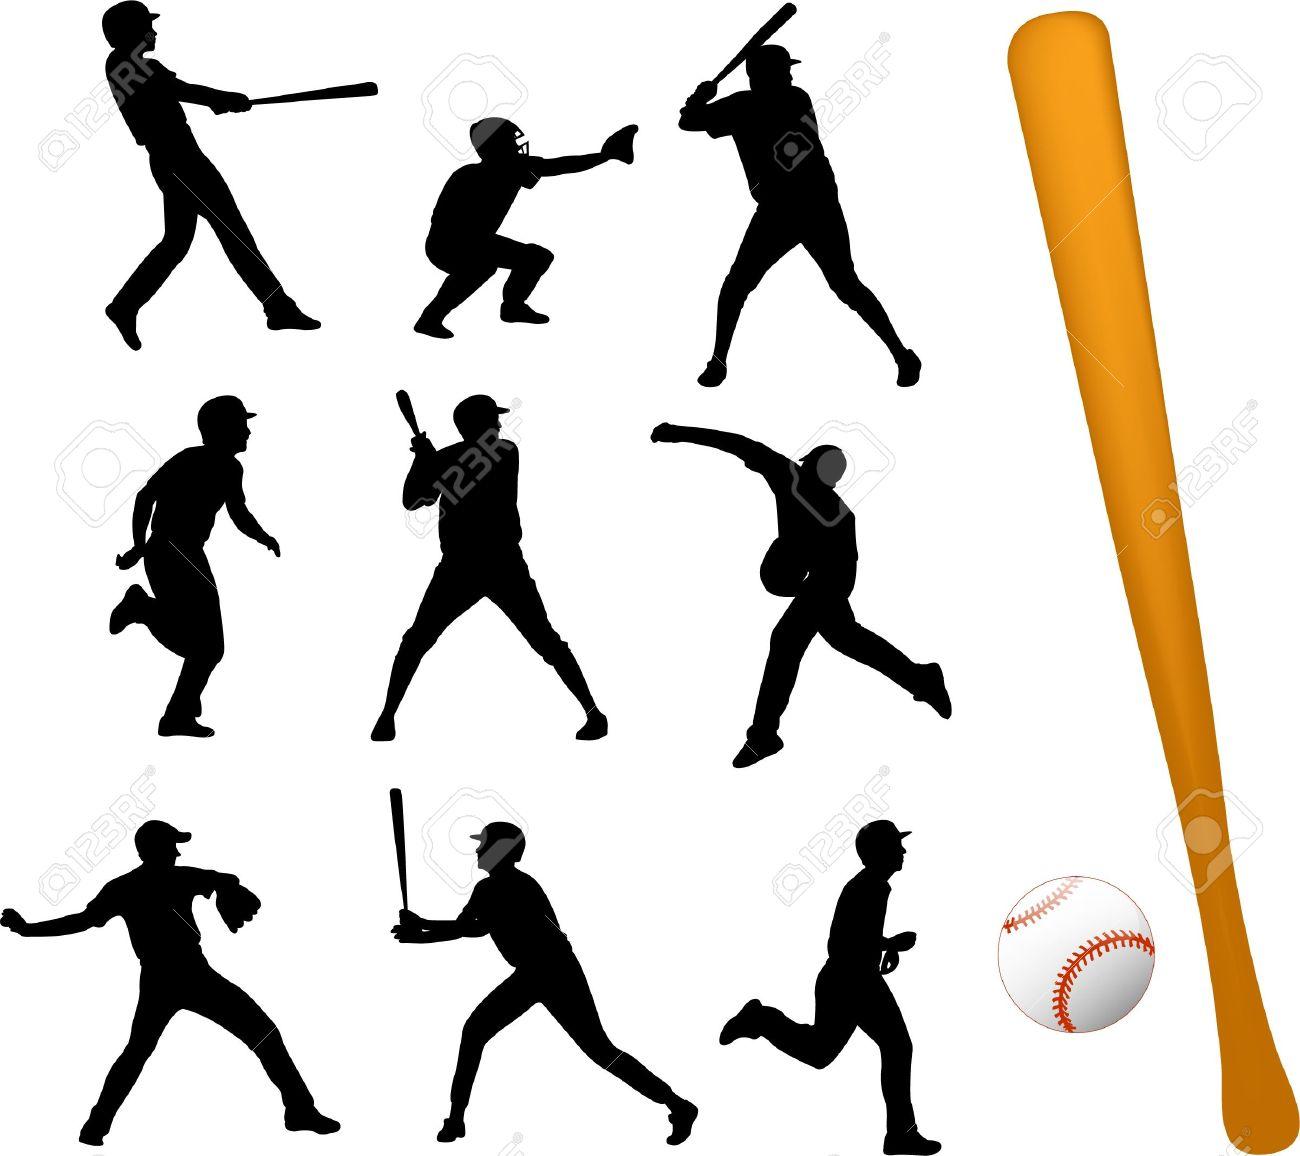 baseball players silhouettes - 9476468